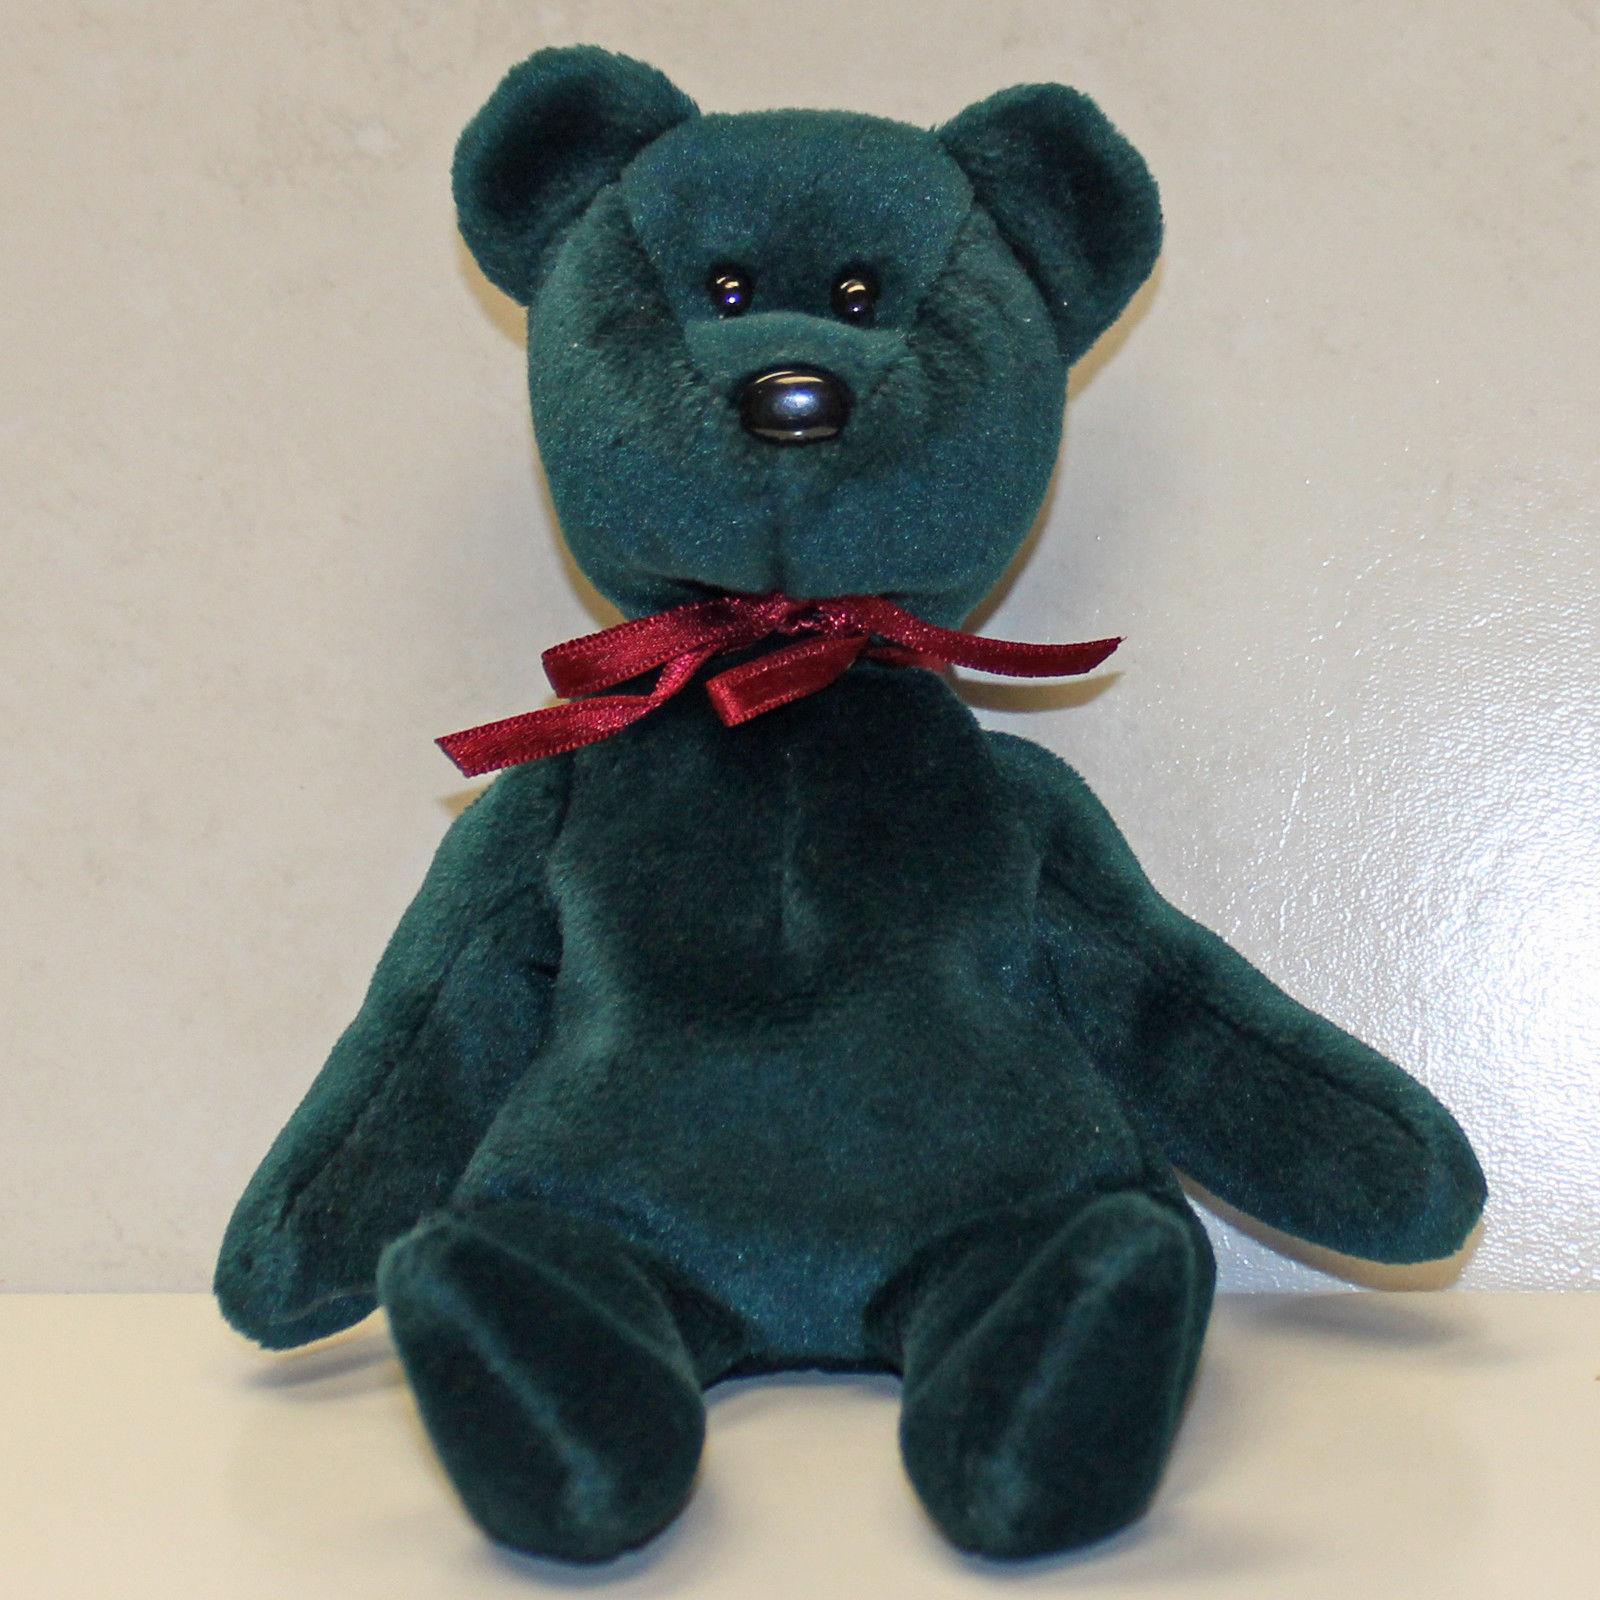 Teddy nf jade - nht - 1 gen hintern - tag - ty beanie baby (sp)